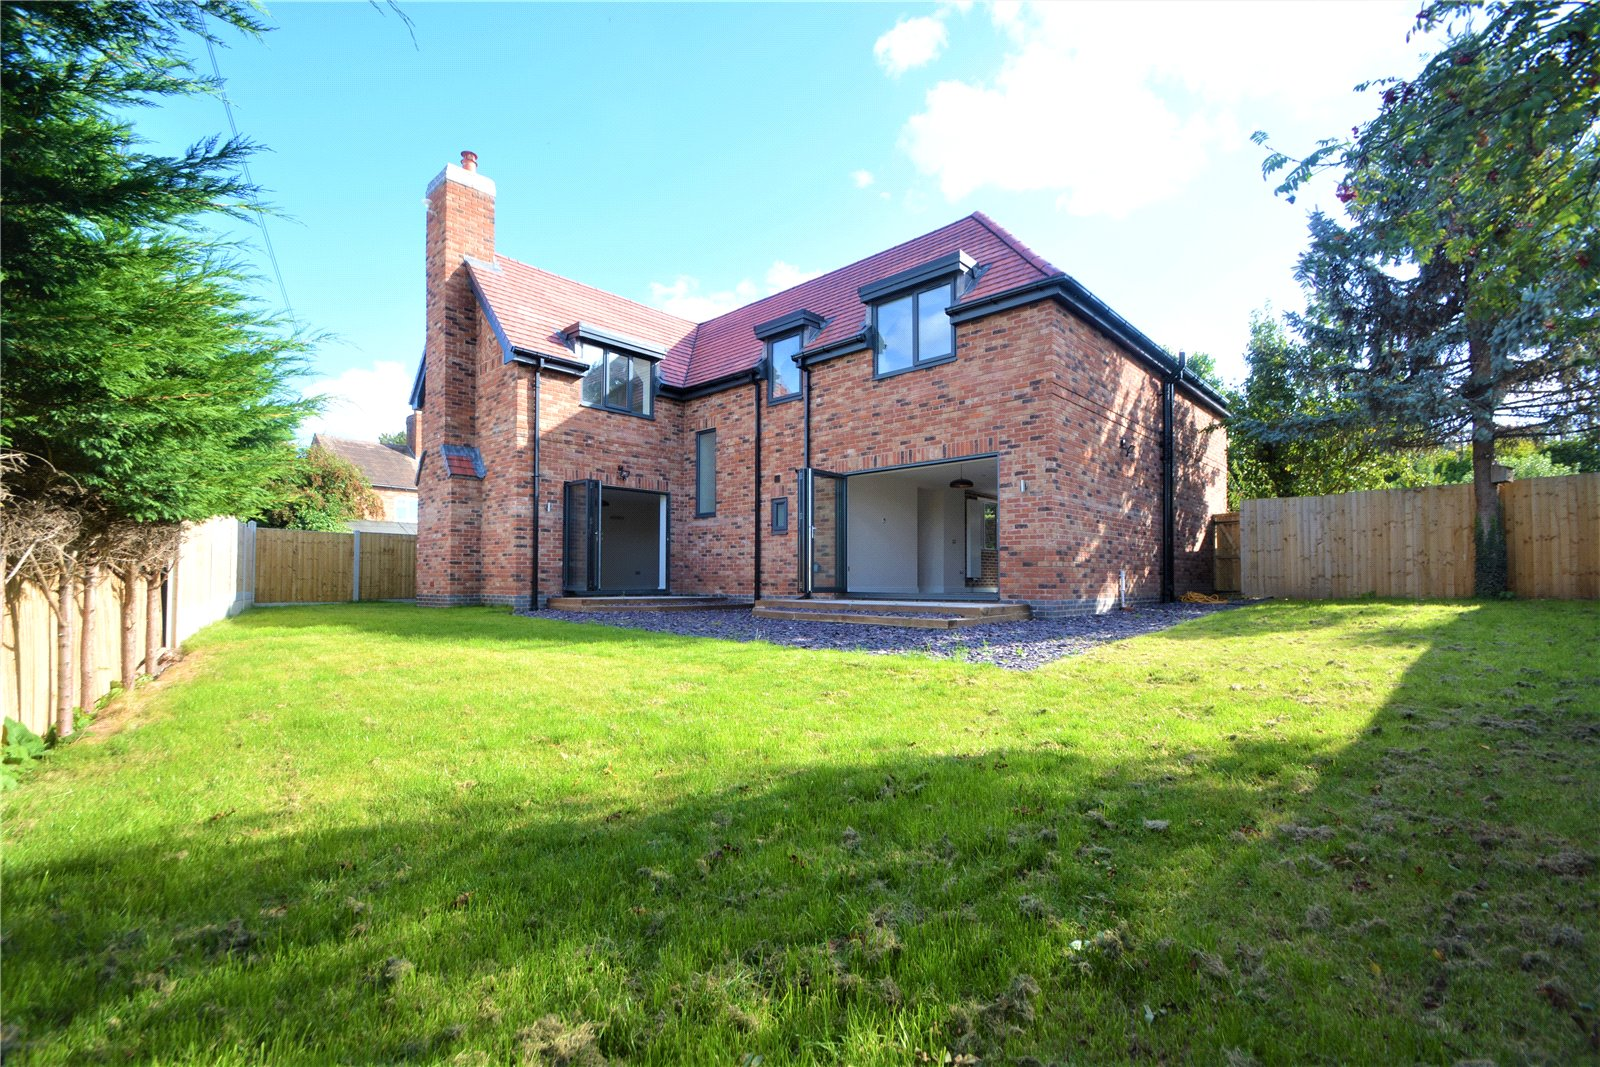 Applewood, Cross Lane, Bayston Hill, Shrewsbury, Shropshire, SY3